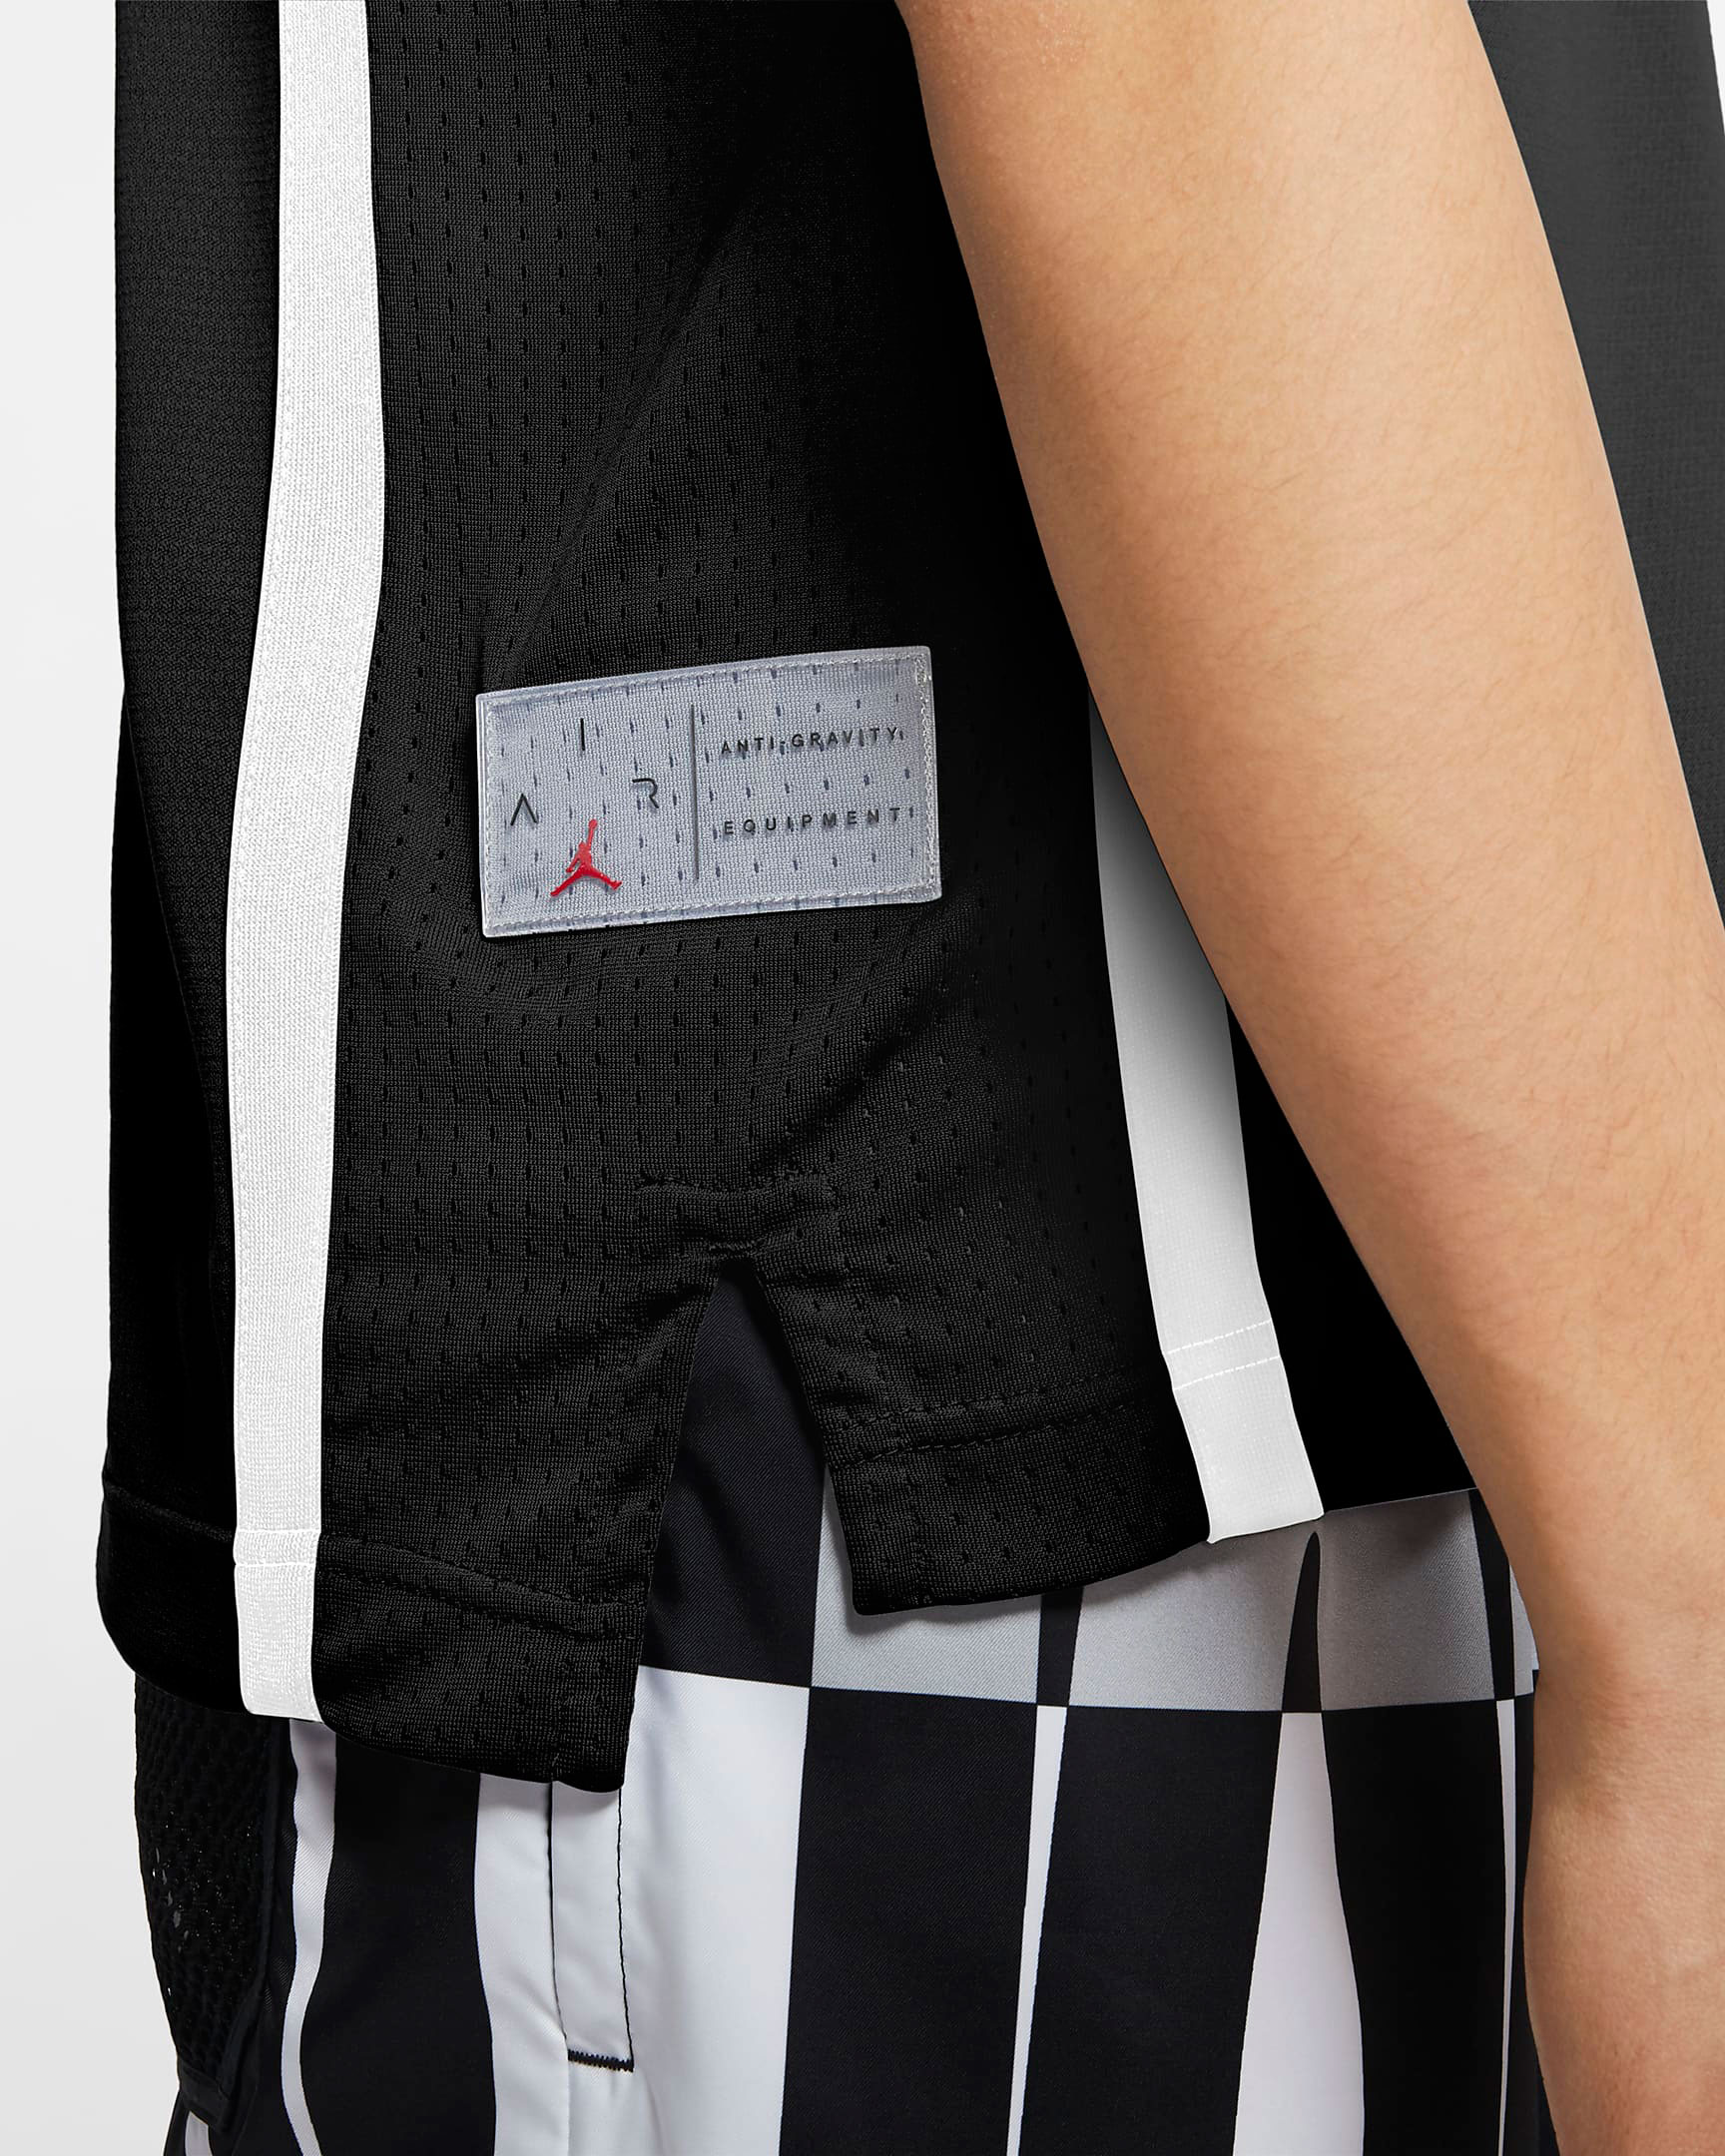 air-jordan-11-jubilee-black-white-jordan-jersey-3